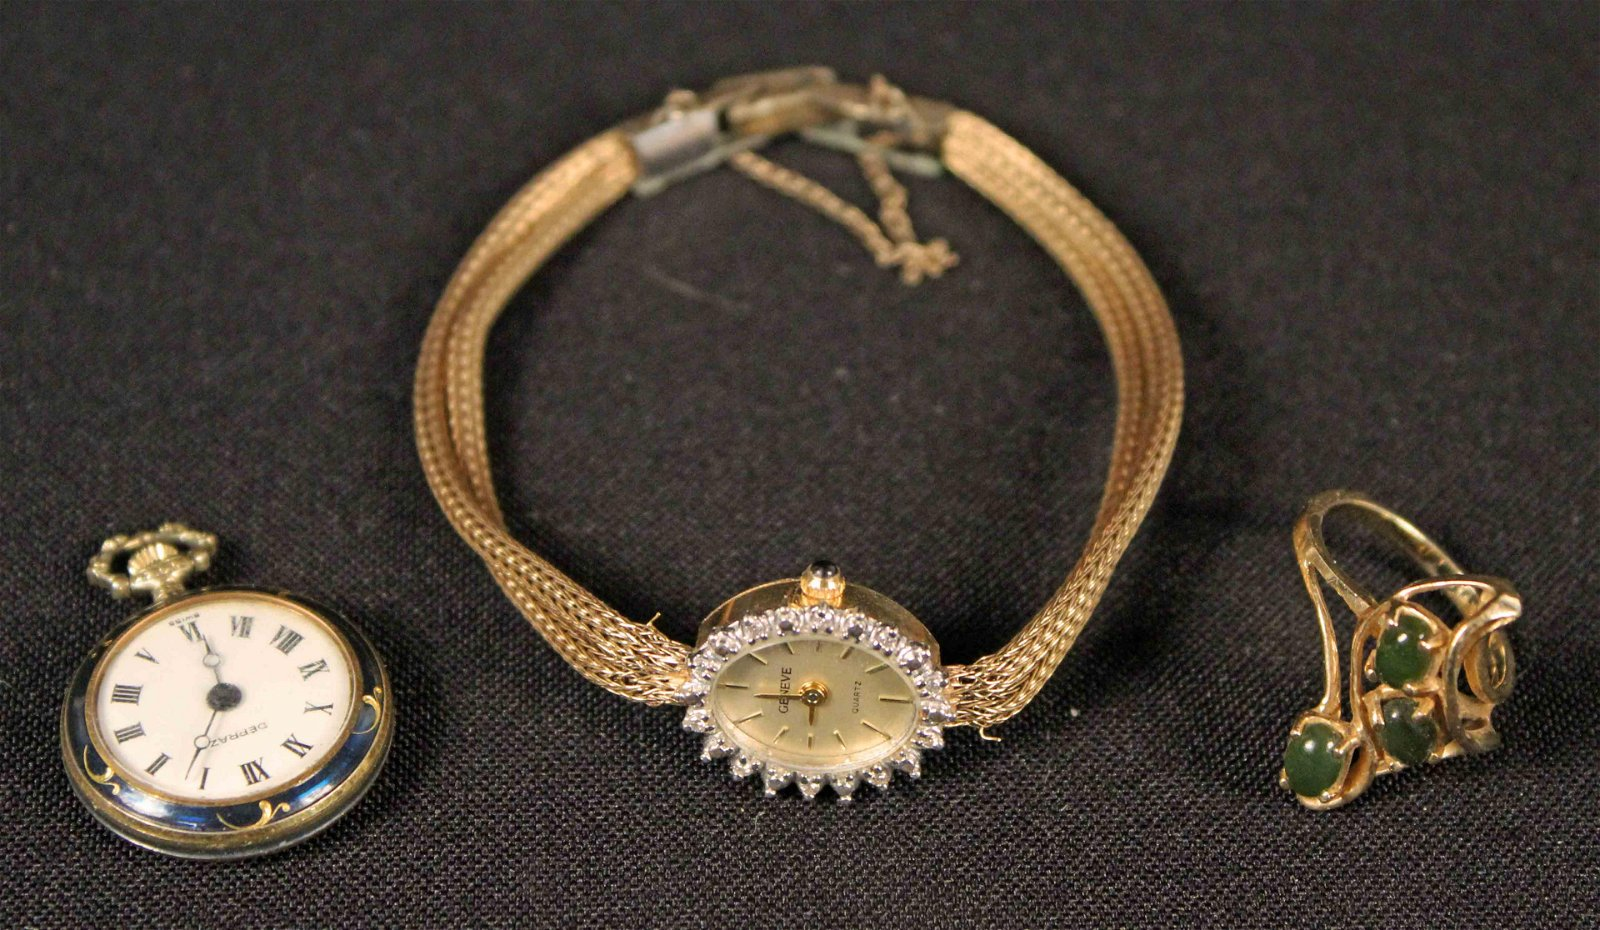 14 K Yellow Gold Wristwatch, Ring w/ Jade & Watch